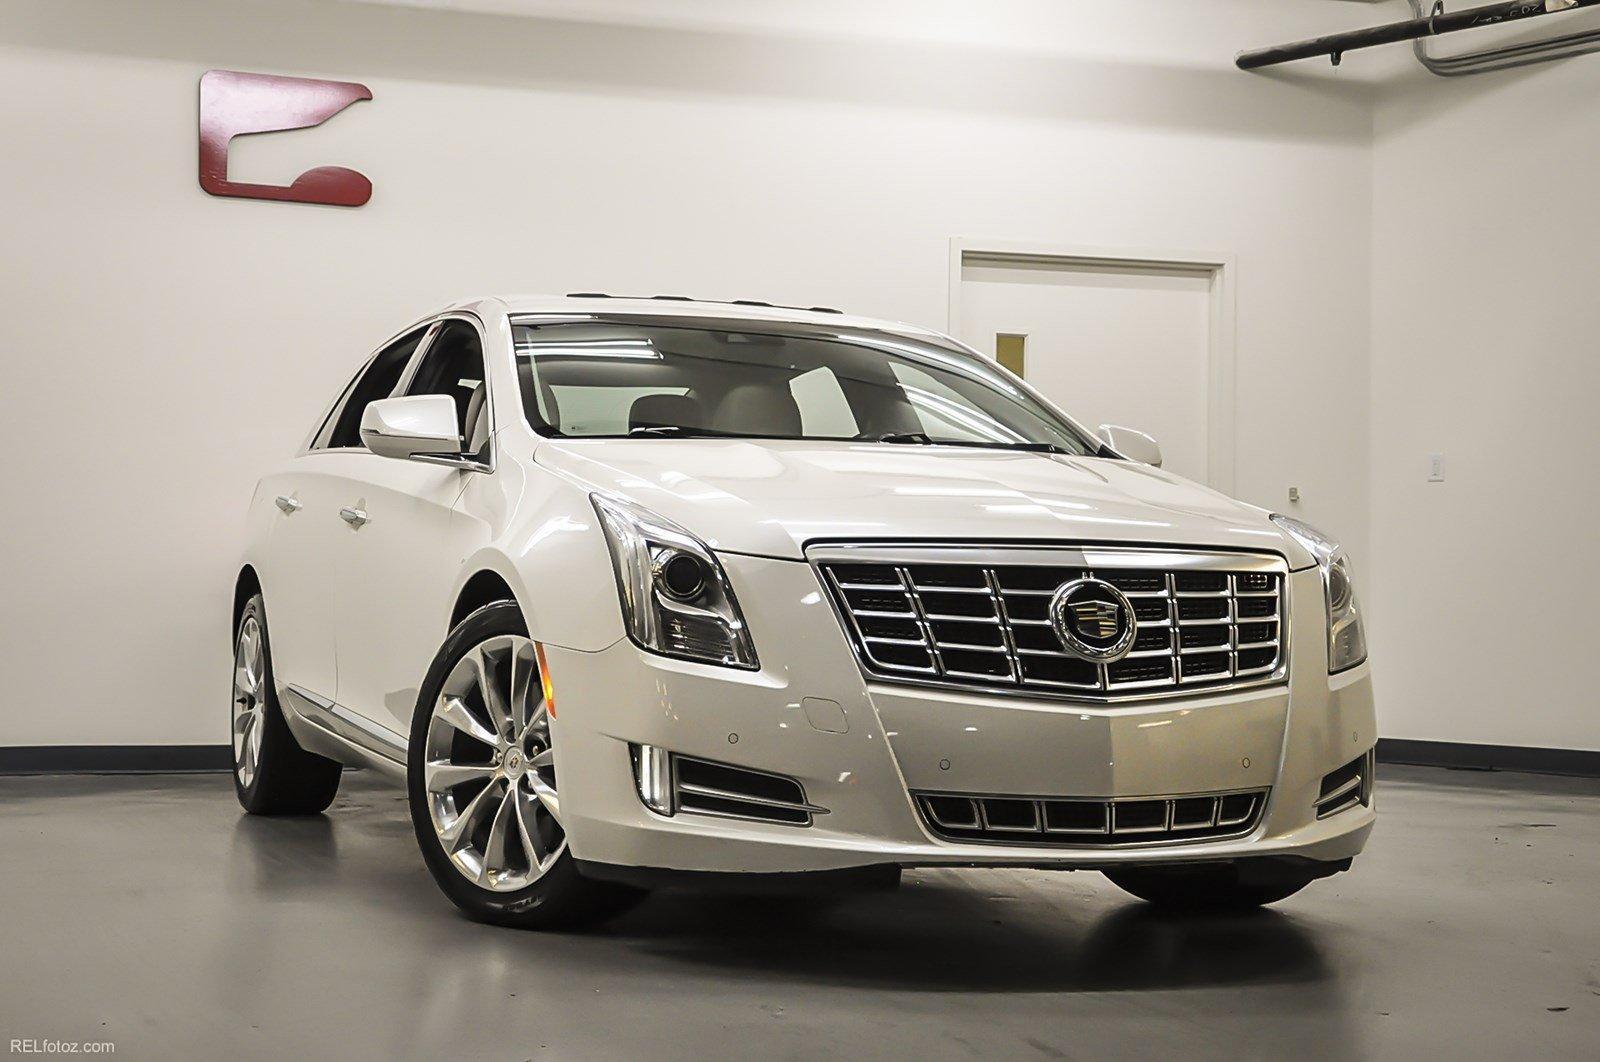 2013 Cadillac XTS Luxury Stock # 105629 for sale near